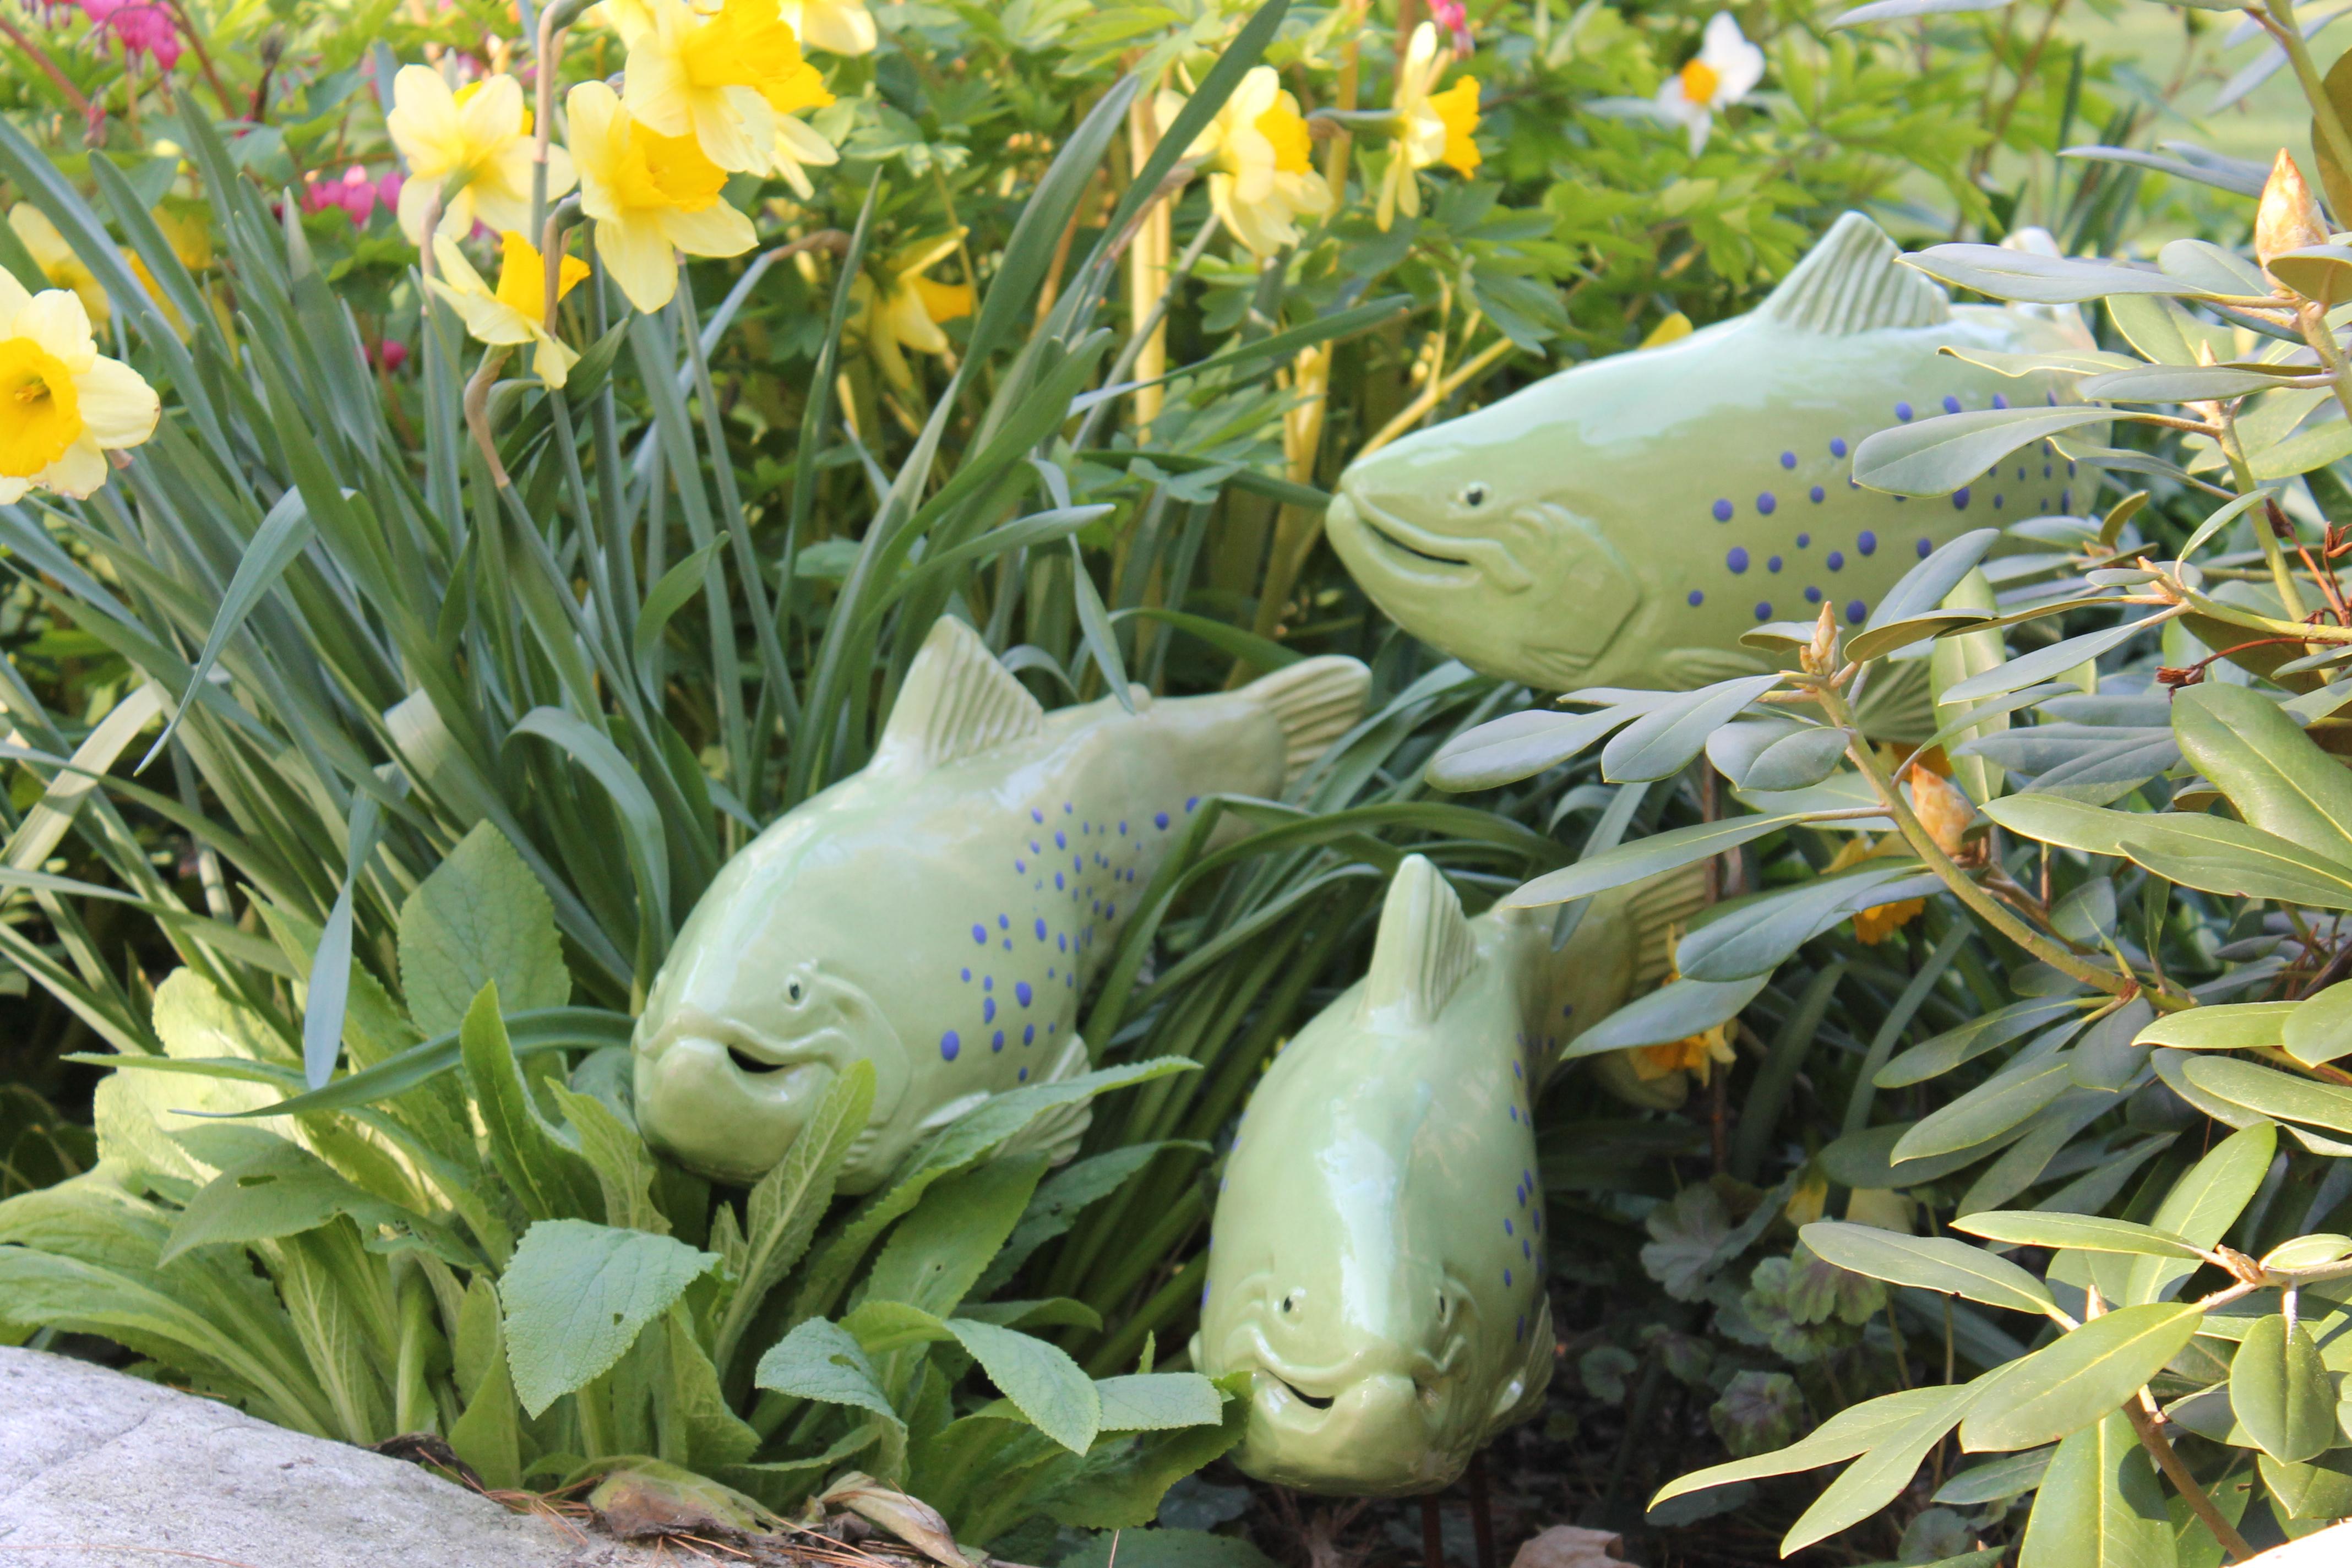 Press room for Garden fish